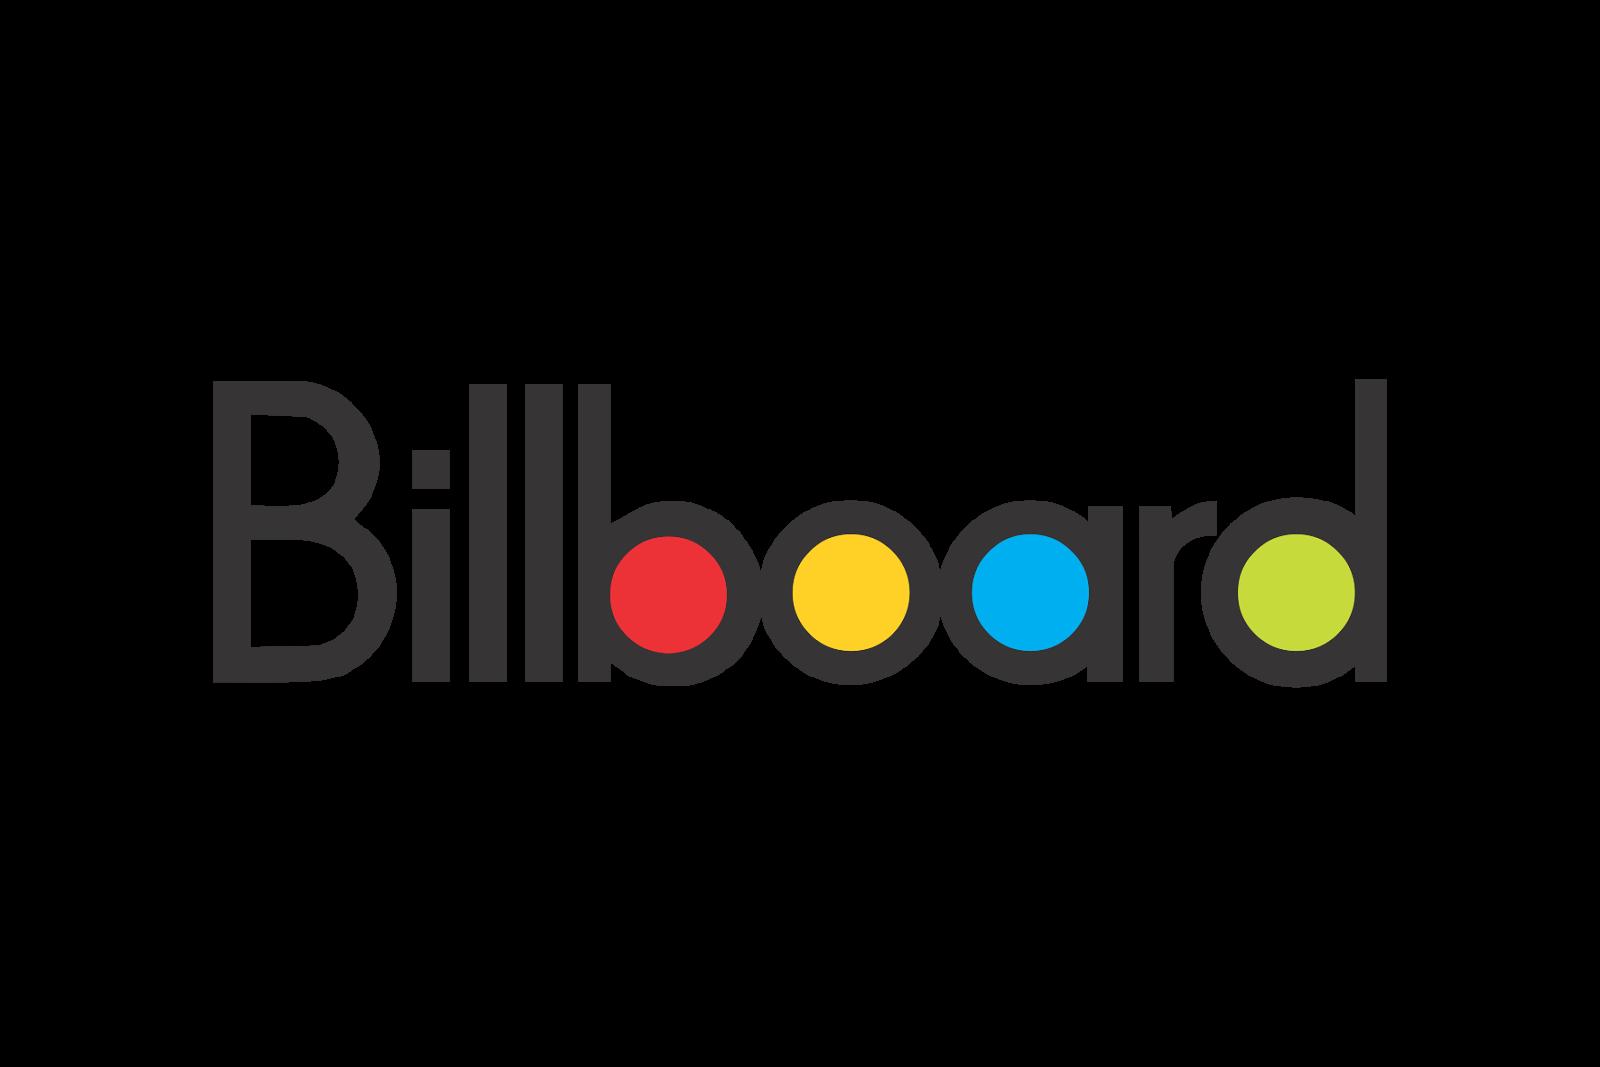 Billboard Logo - Bing images